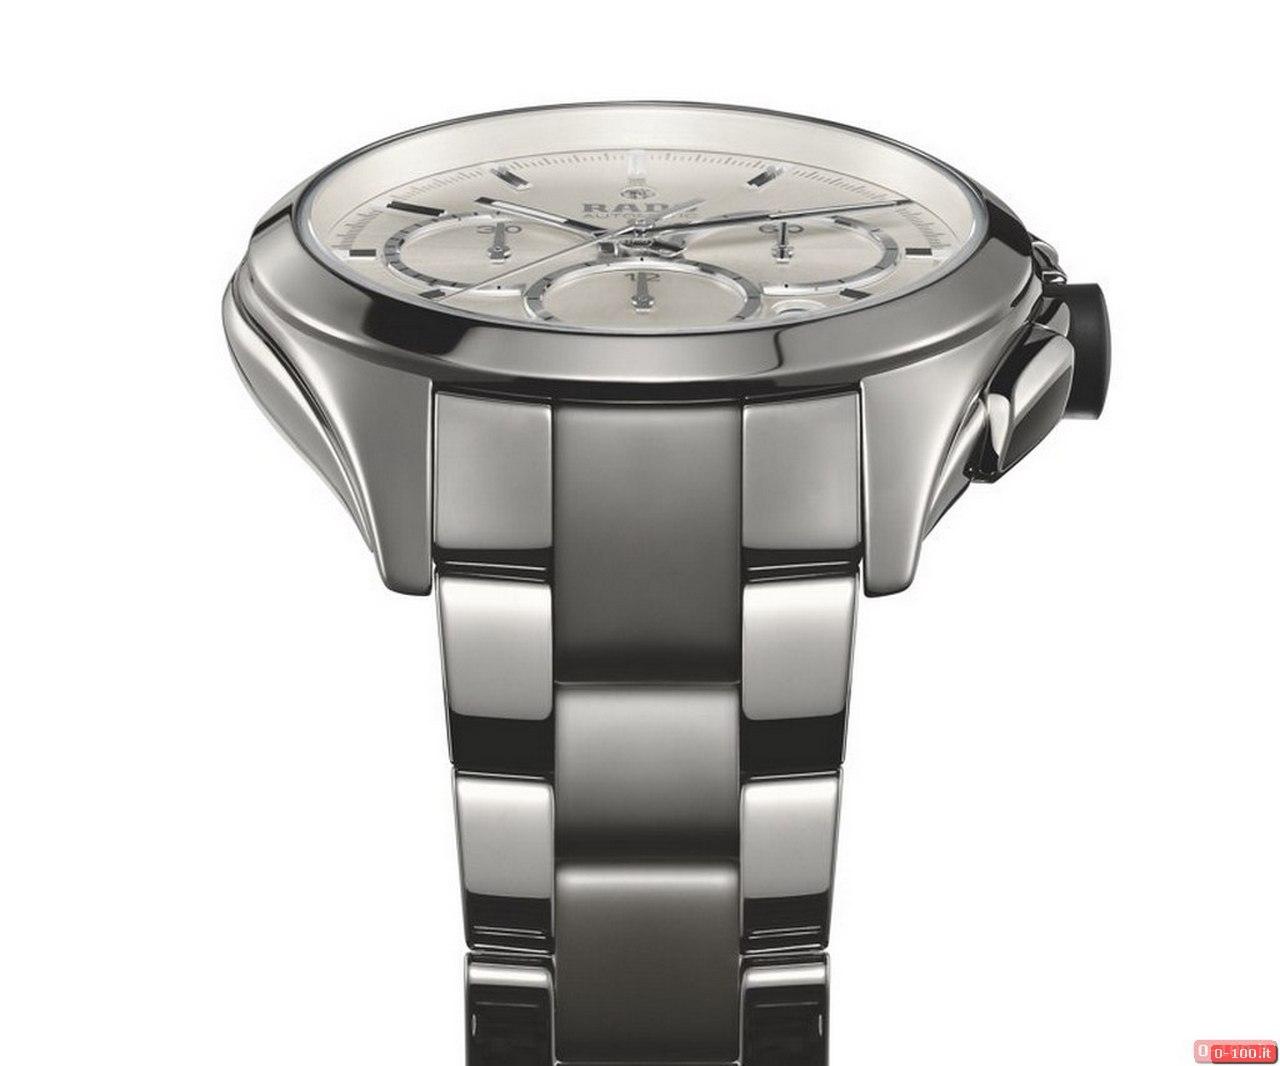 anteprima-baselworld-2014-rado-hyperchrome-automatic-chronograph-plasma-ceramic-prezzo-price_0-1002